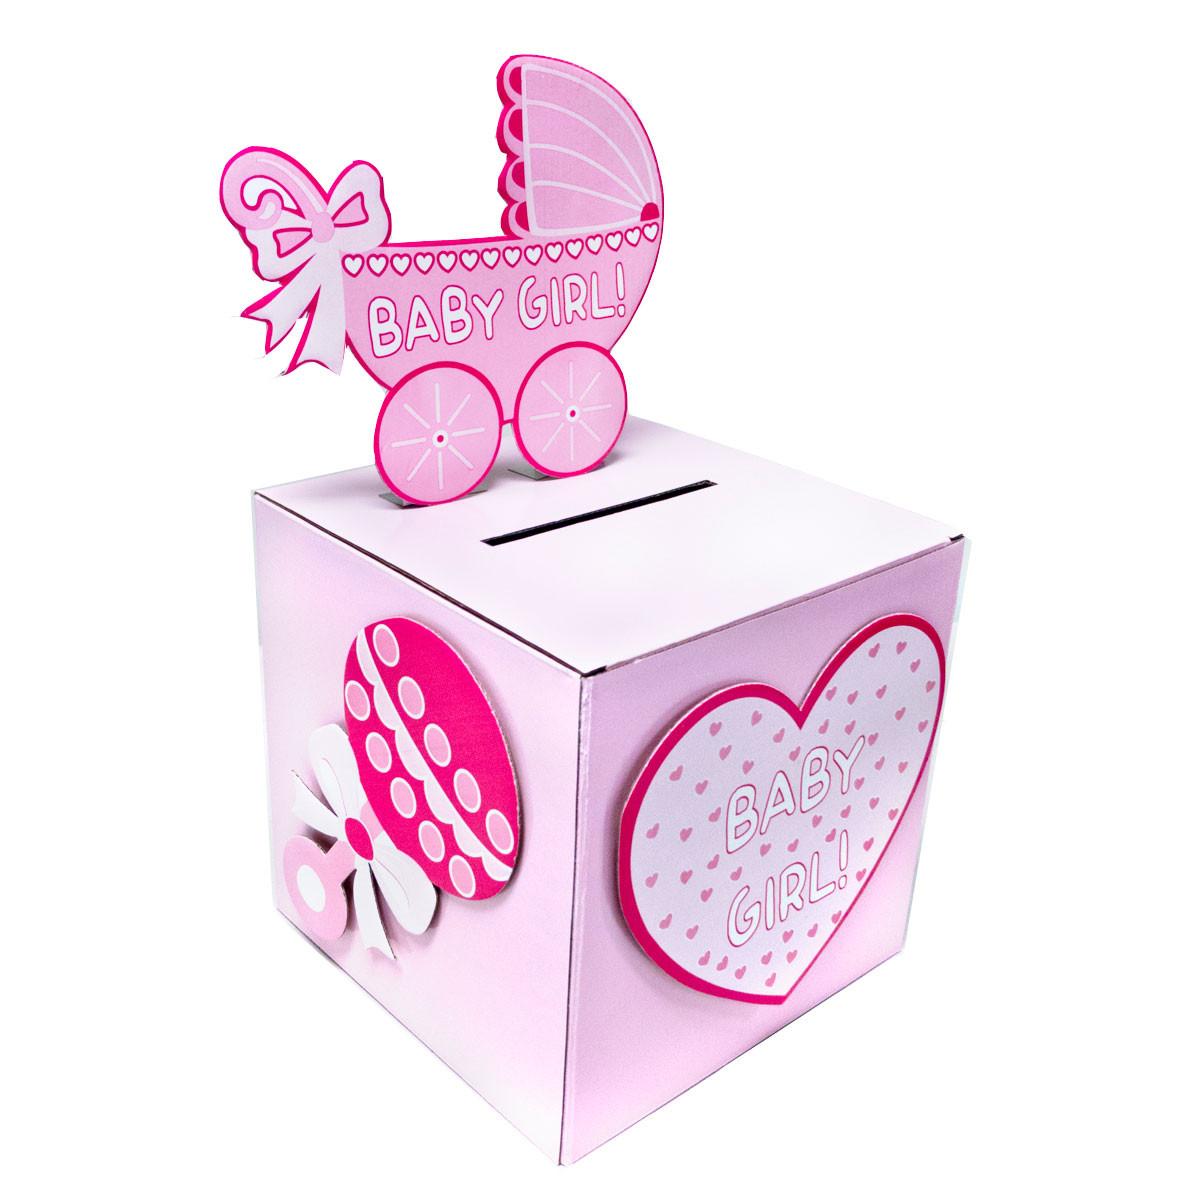 Baby Shower Wishing Well Gift Ideas  Baby Shower Wishing Well Card Box Decoration Keepsake